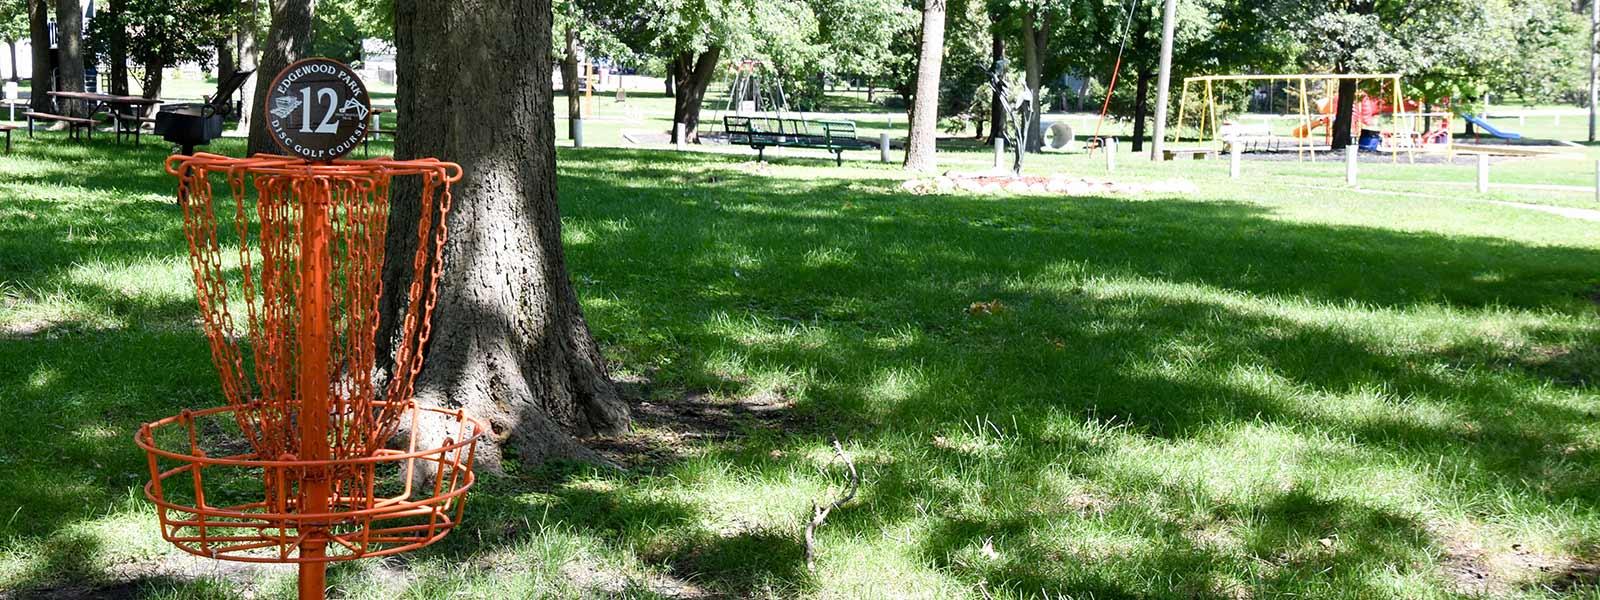 Edgewood Park Disk Golf